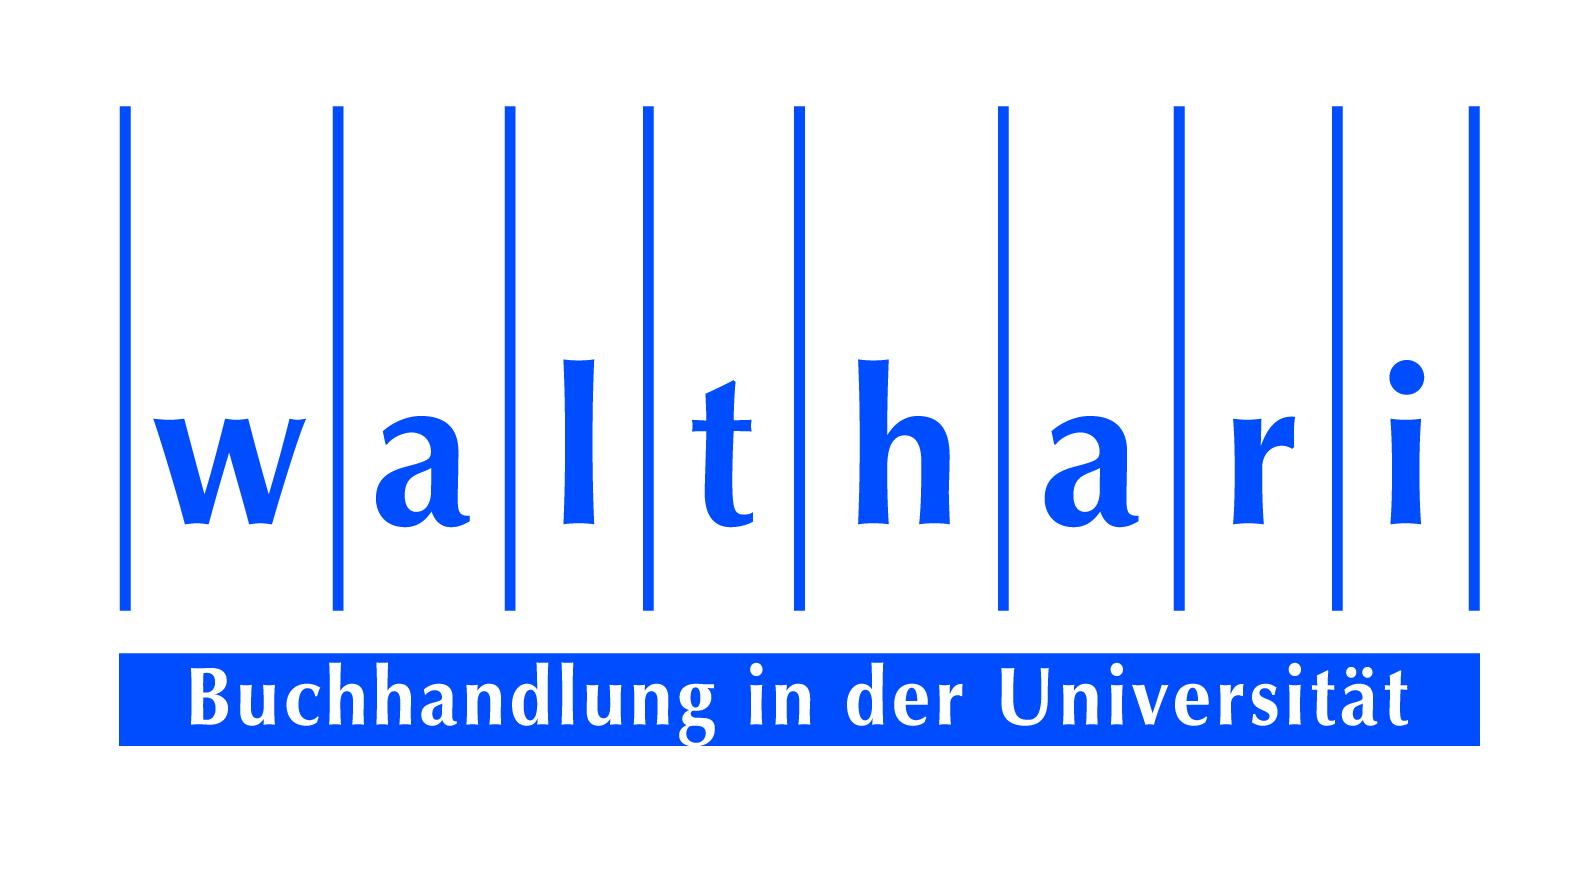 Logo Walthari